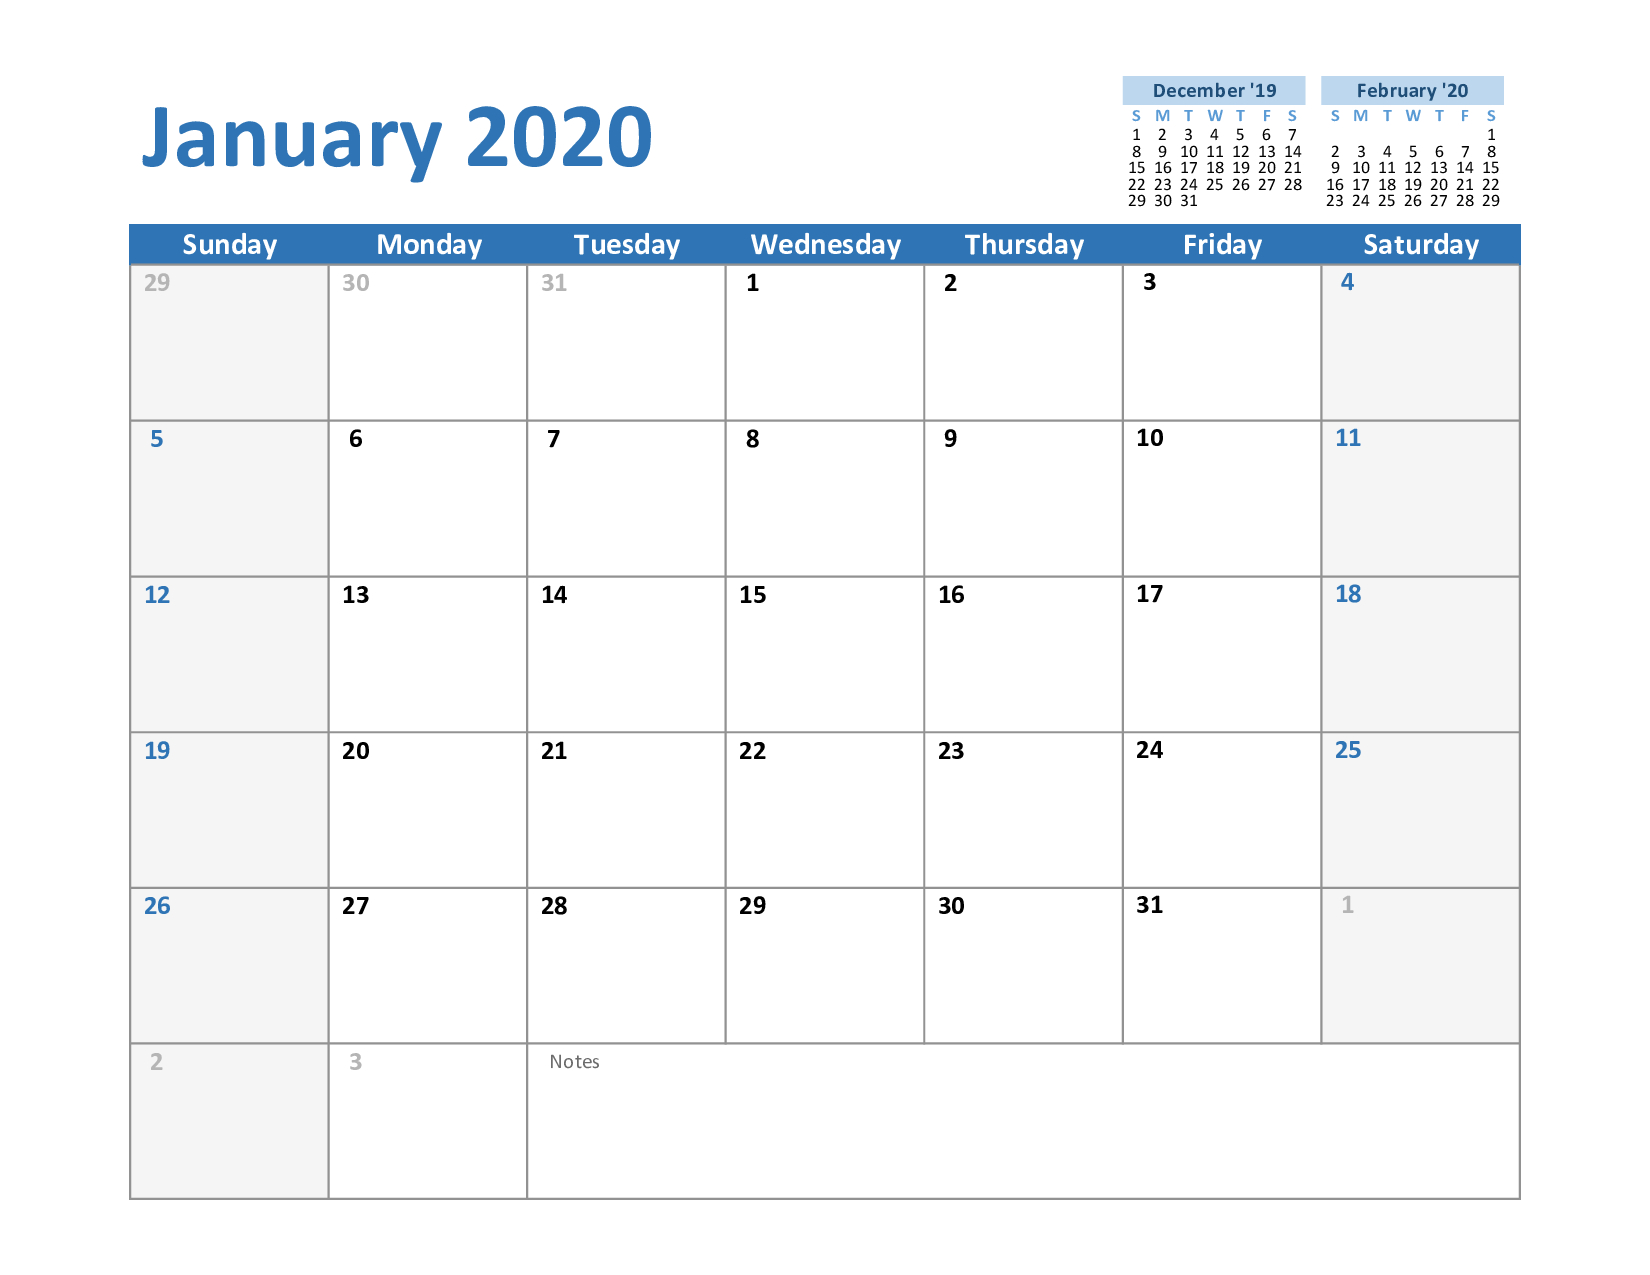 Free Printable January 2020 Calendar Editable In Pdf-Free Editable Calendar Template 2021 Excel